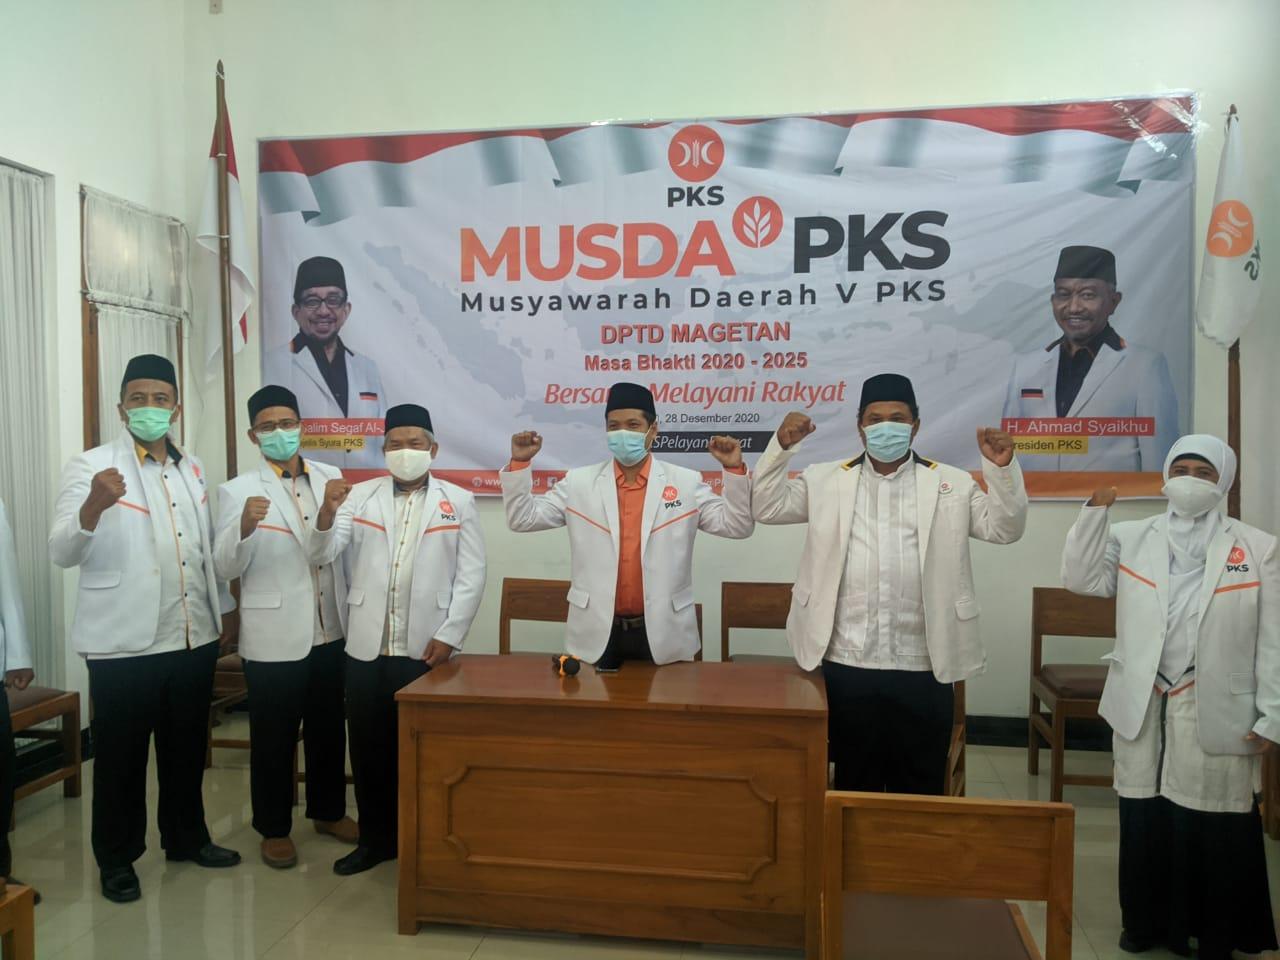 Musda V, Struktur Kepengurusan PKS Magetan Periode 2020-2025